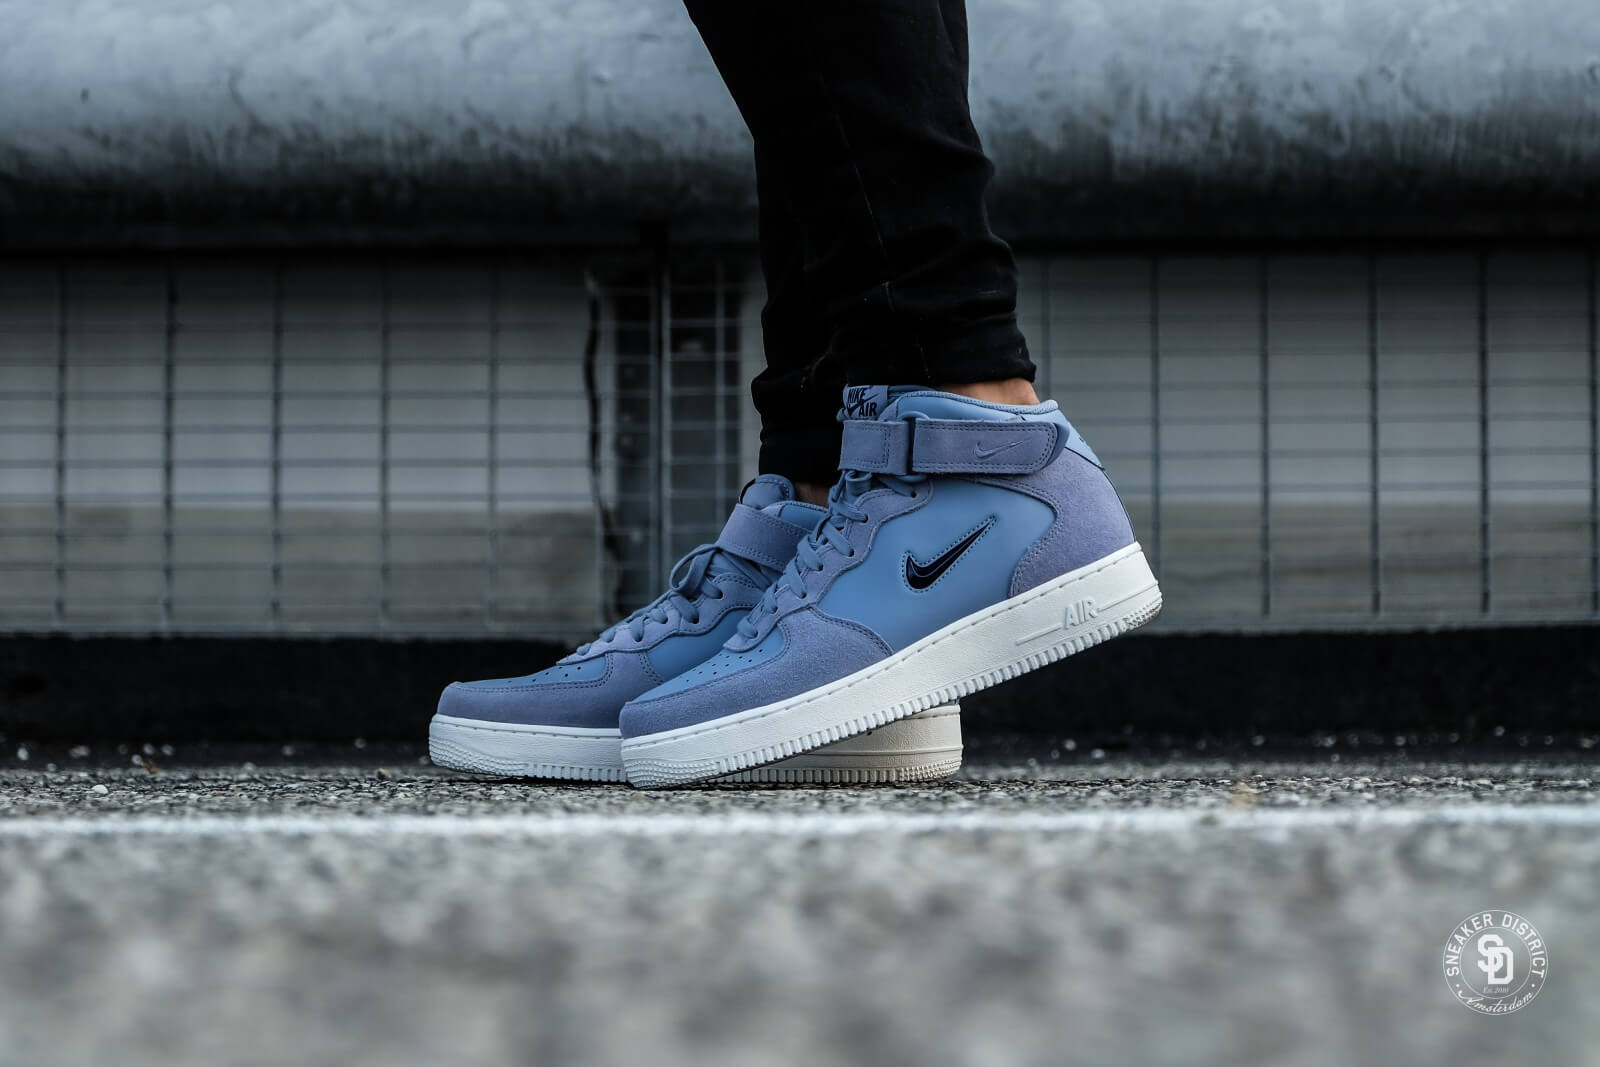 nike air force 1 mid 07 blue